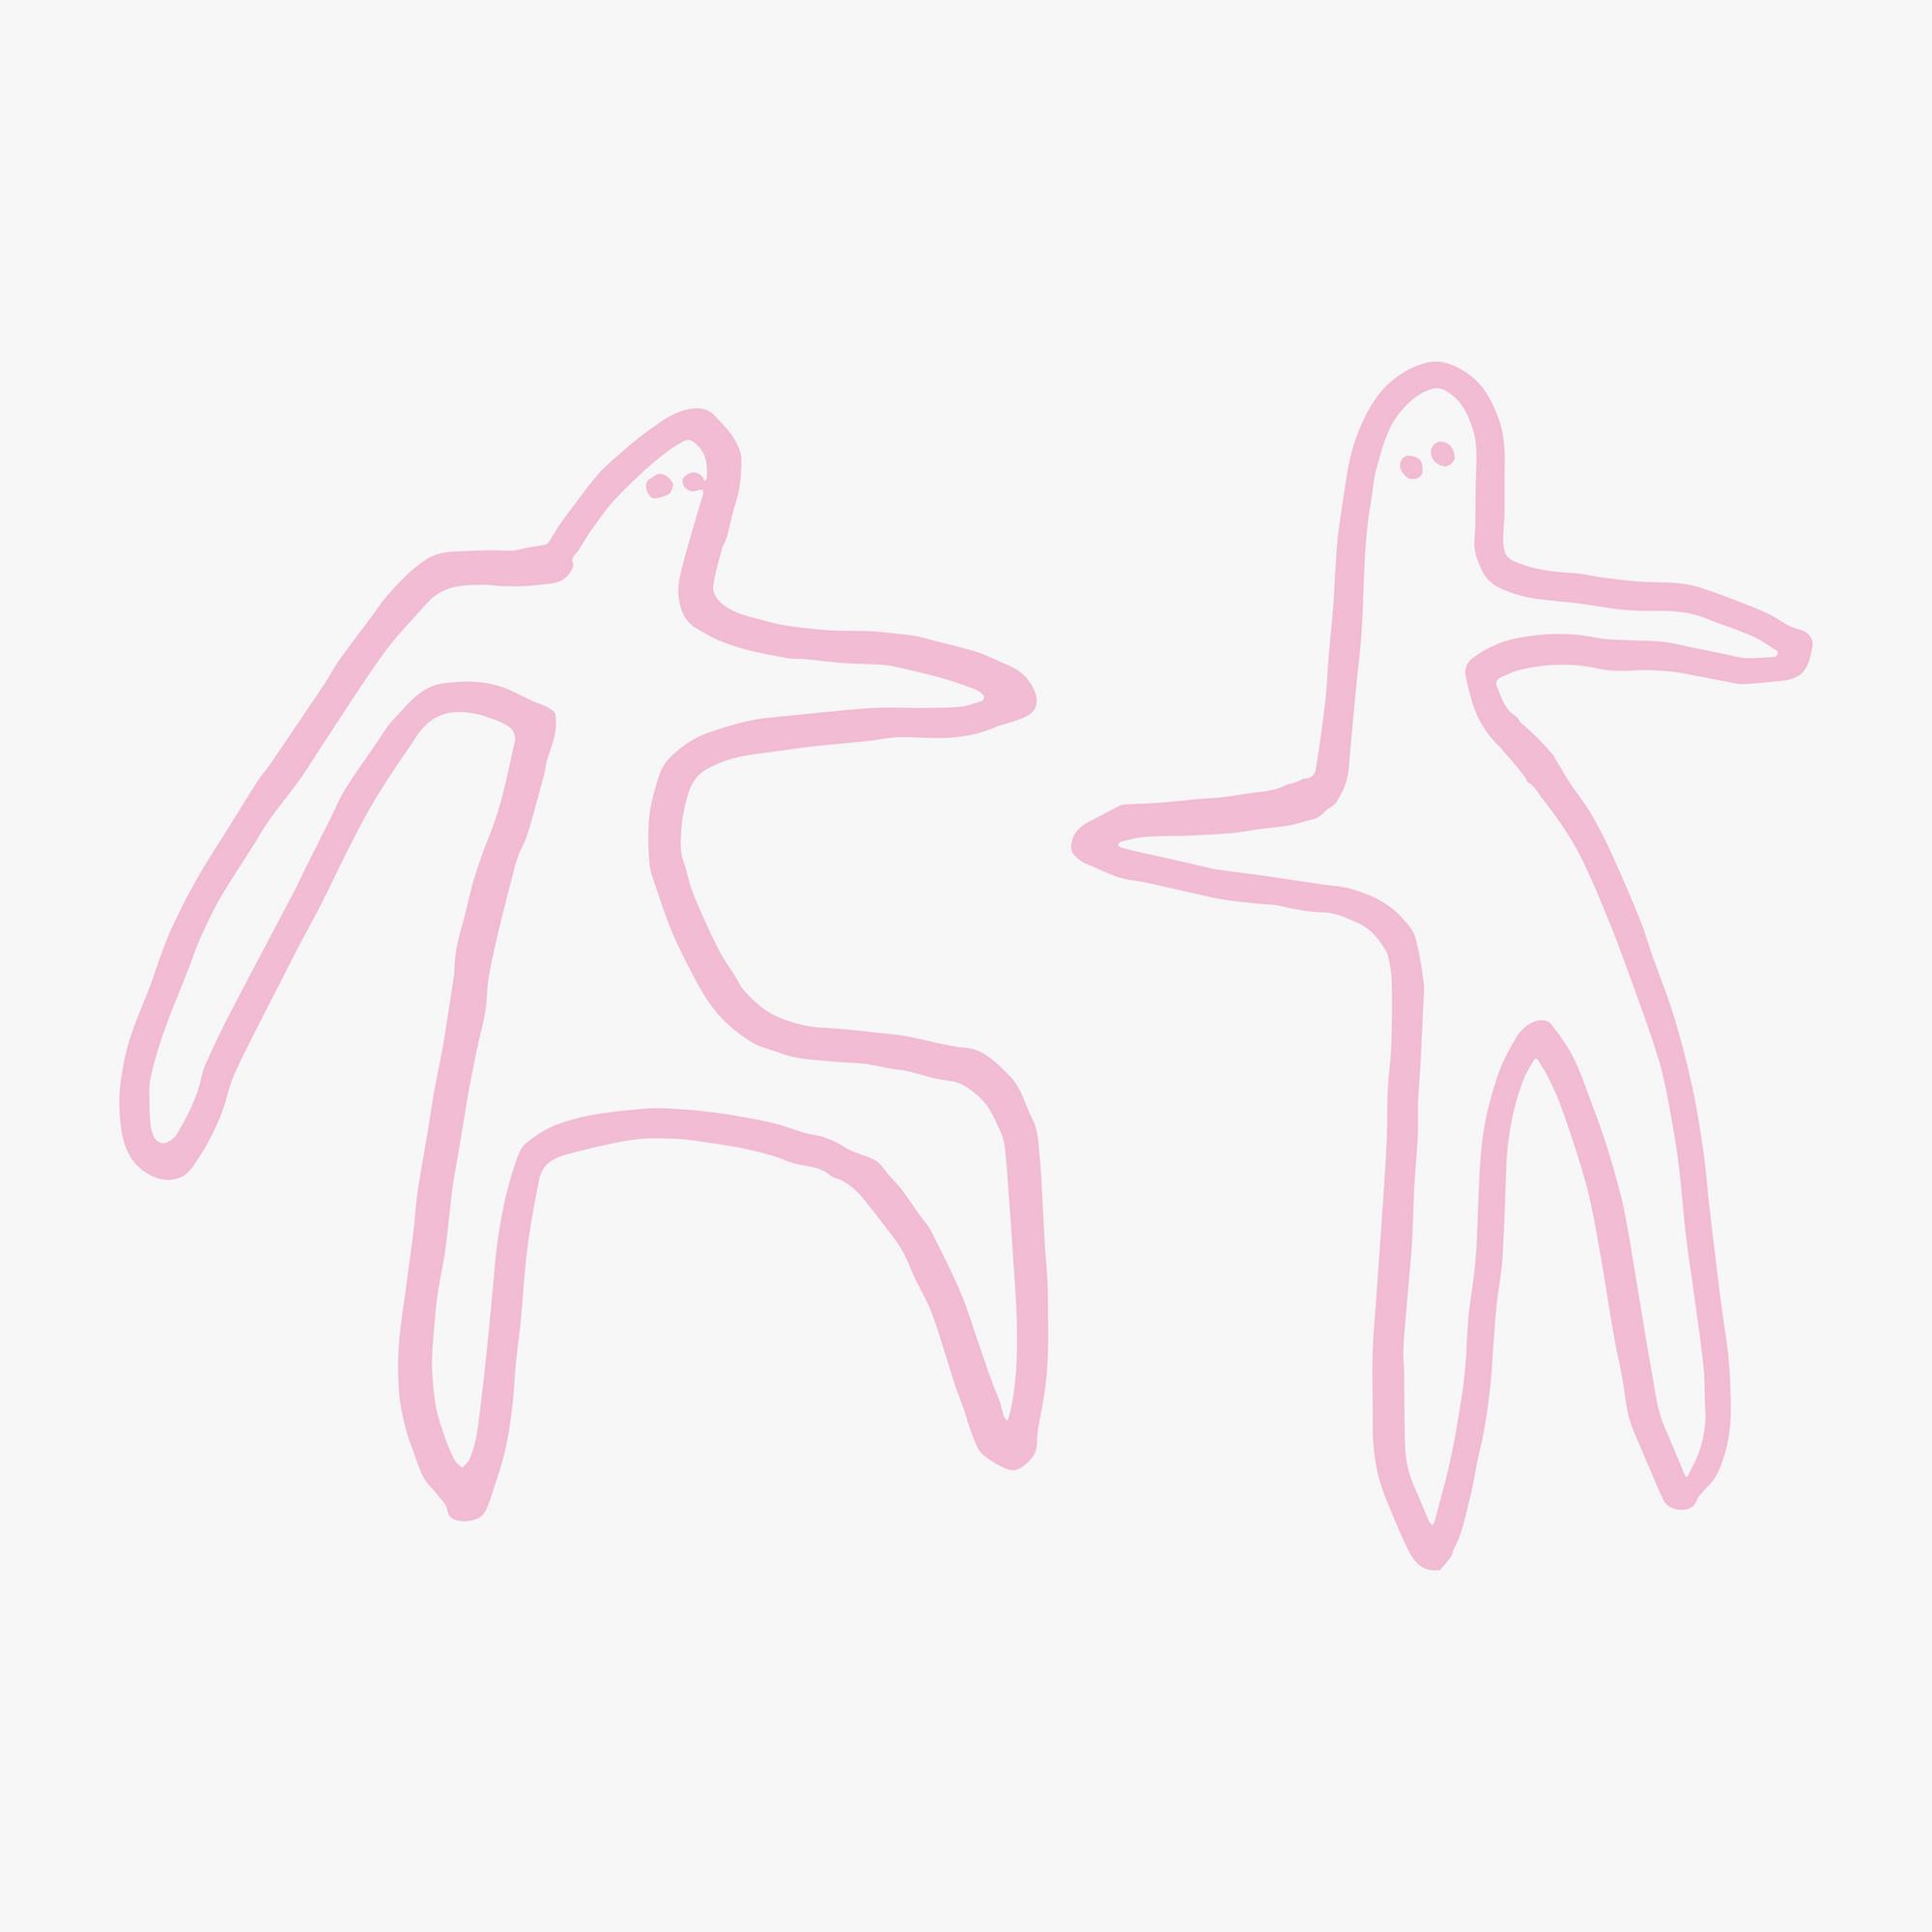 Overmono (Tessela & Truss) announce Raft Living EP on Poly Kicks